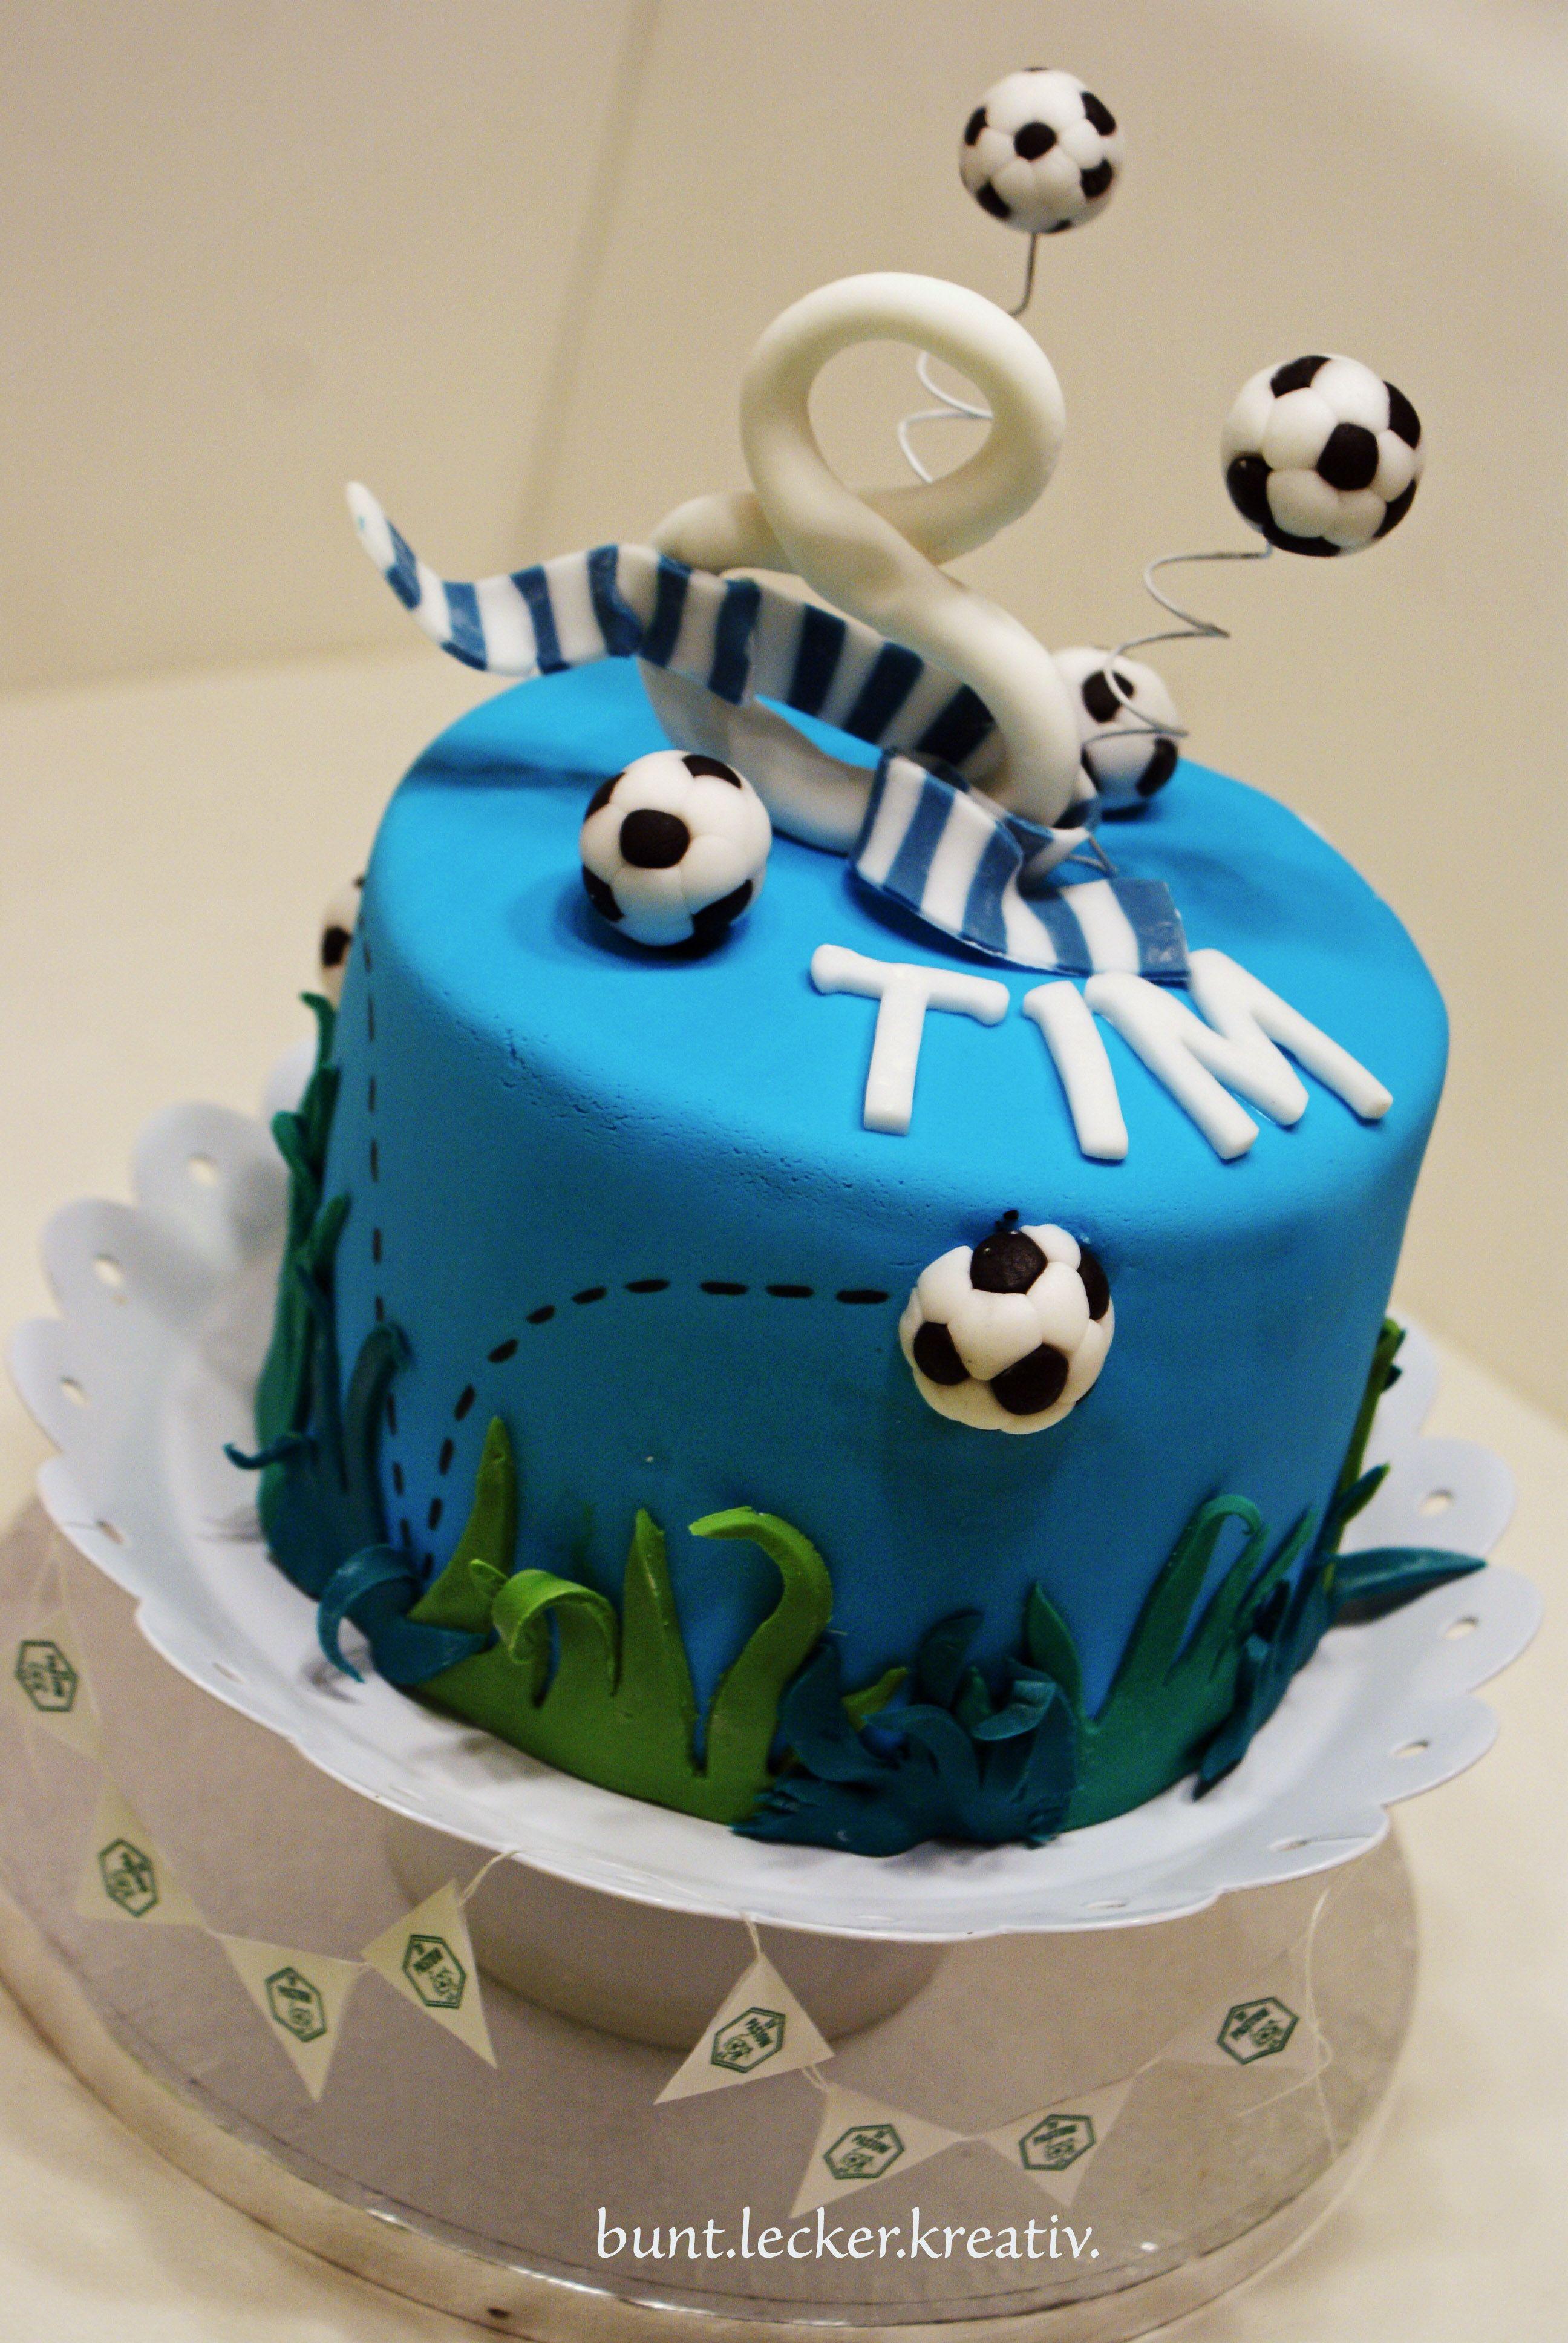 fu ball torte football soccer cake themed cakes pinterest fu ball torte. Black Bedroom Furniture Sets. Home Design Ideas